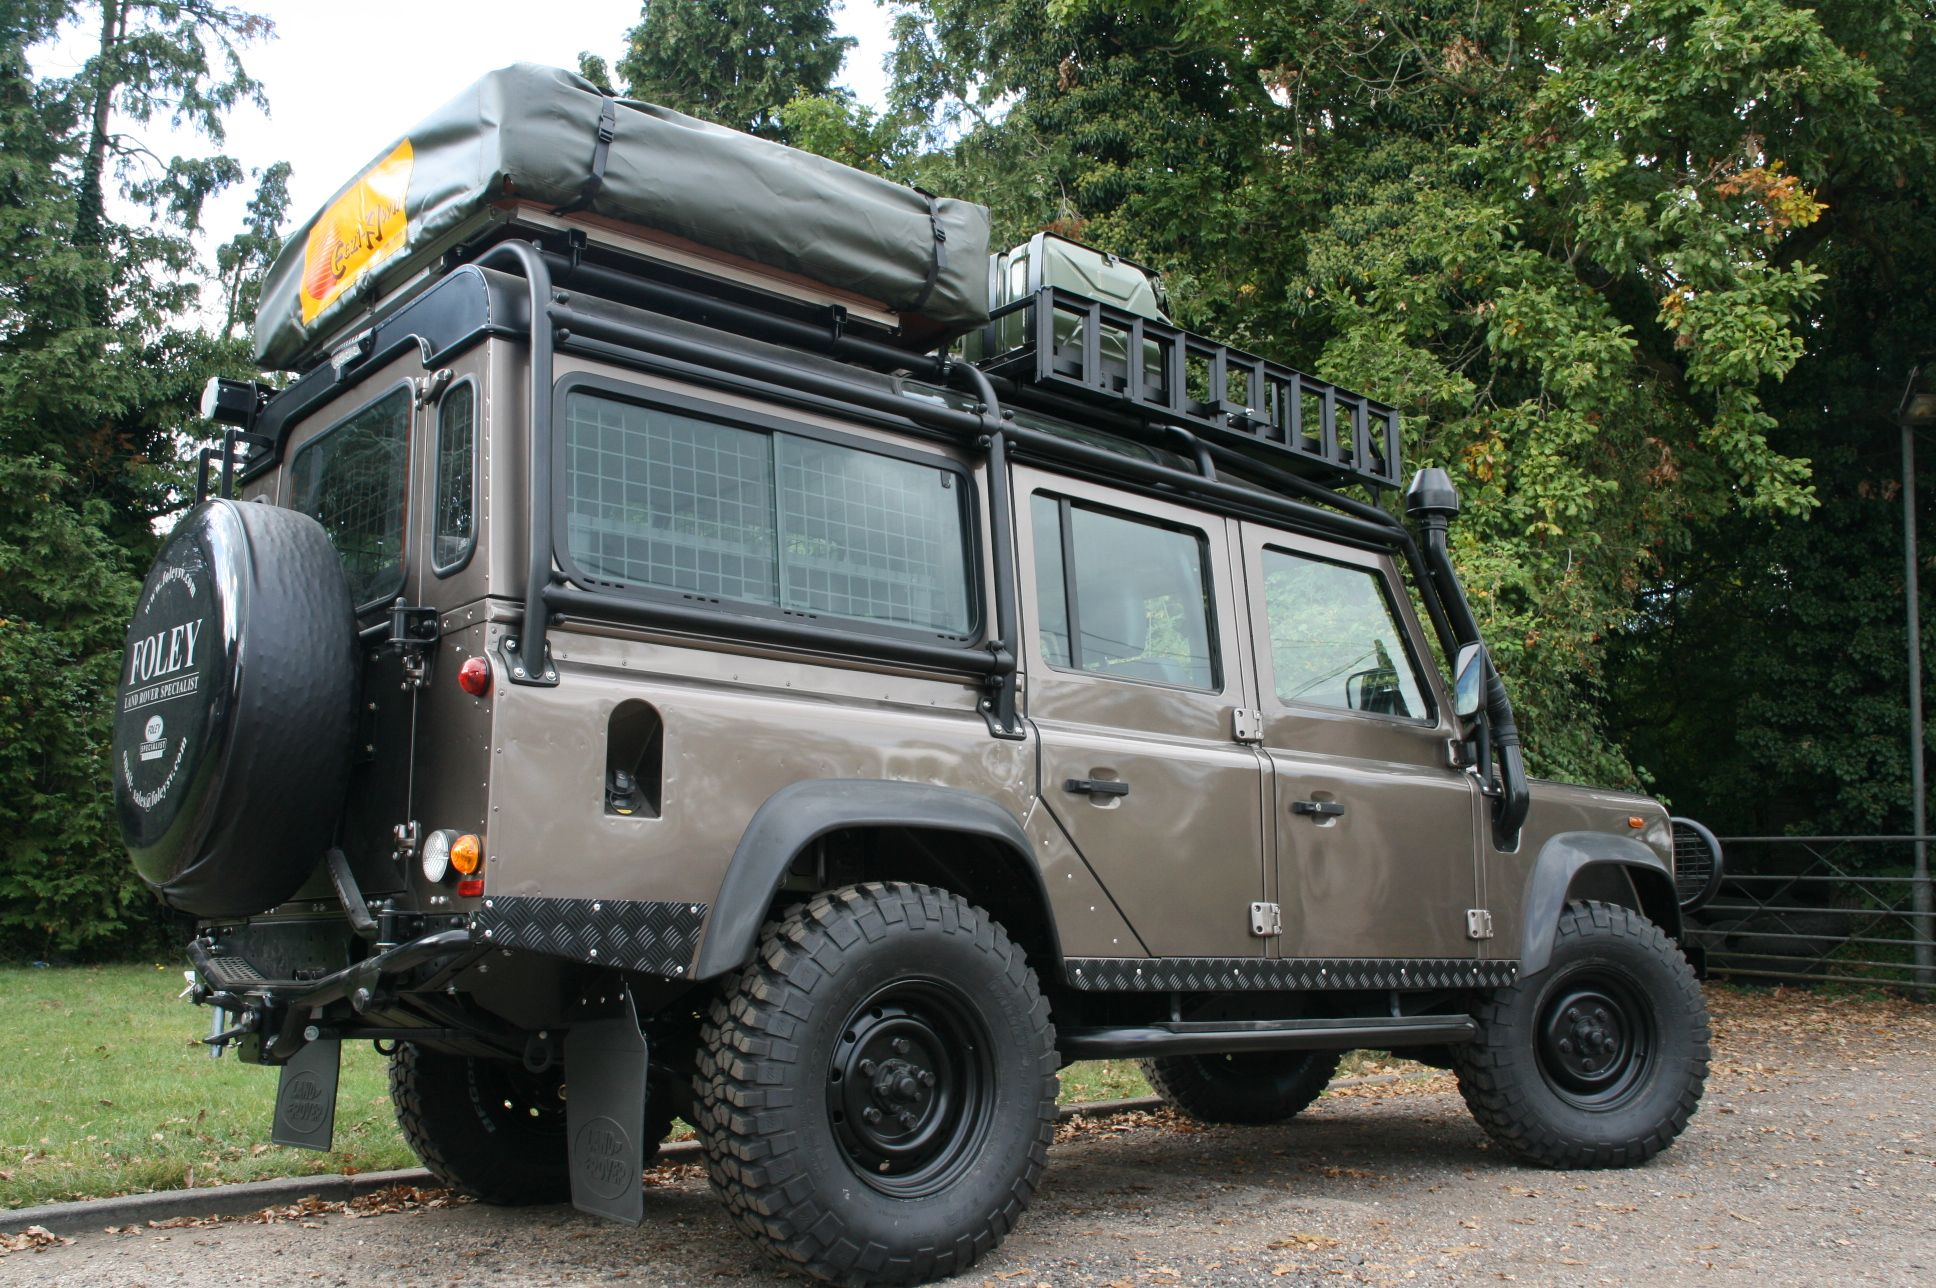 Land Rover Defender 110 with full Foley overland Spec